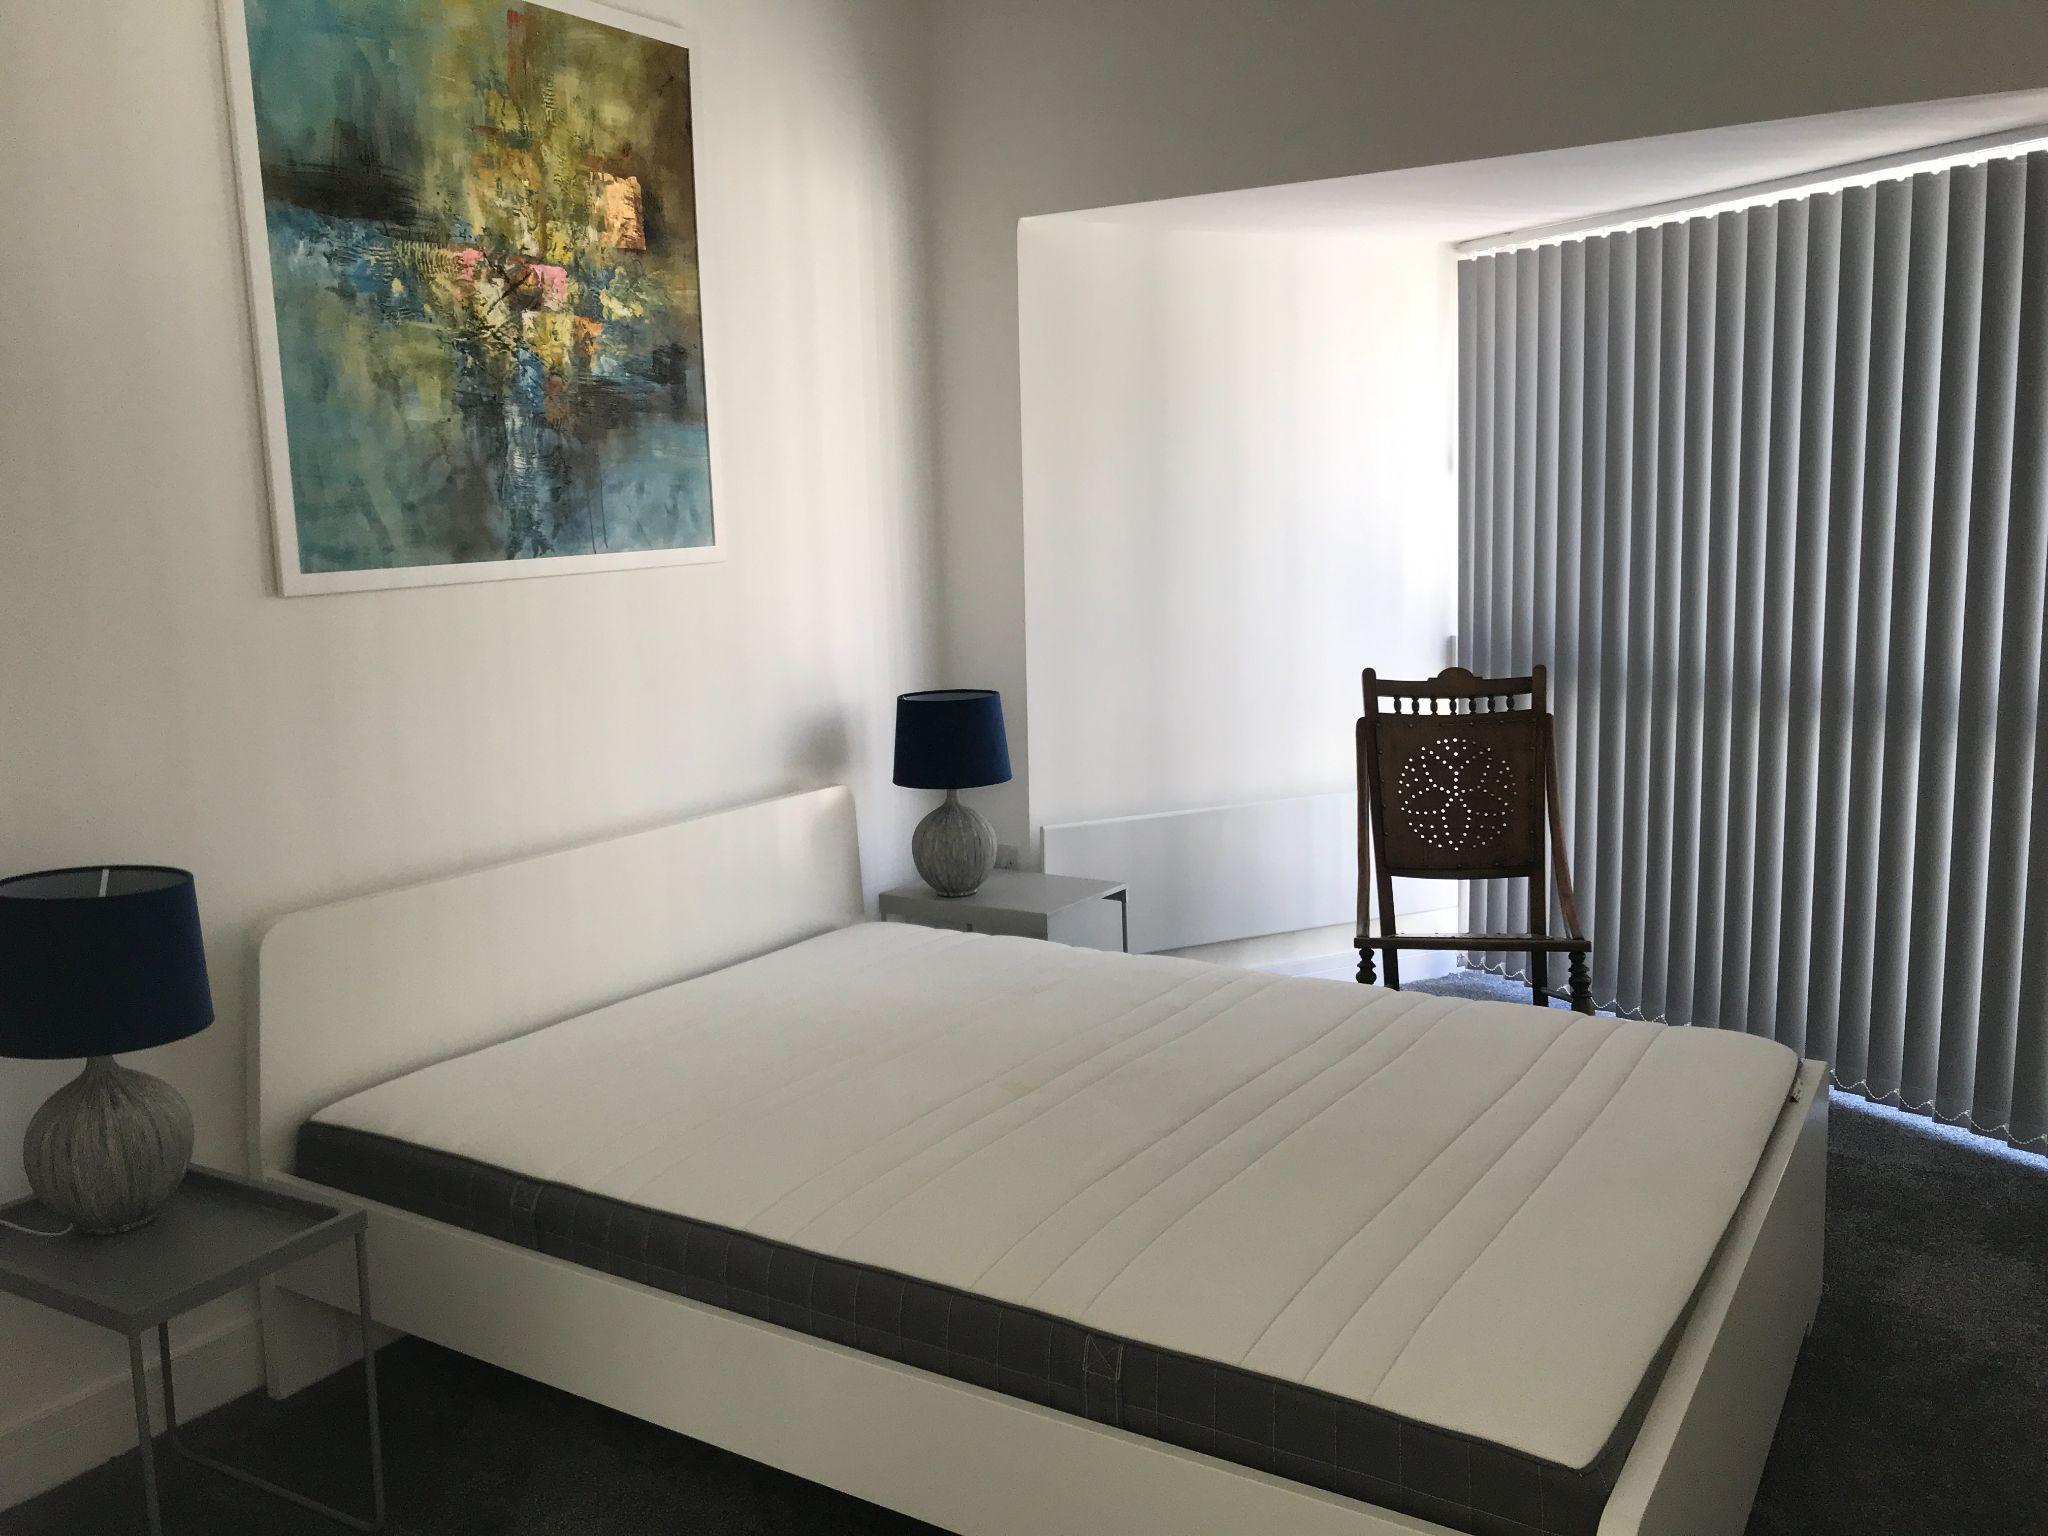 2 Bedroom Apartment Flat/apartment - Photograph 5